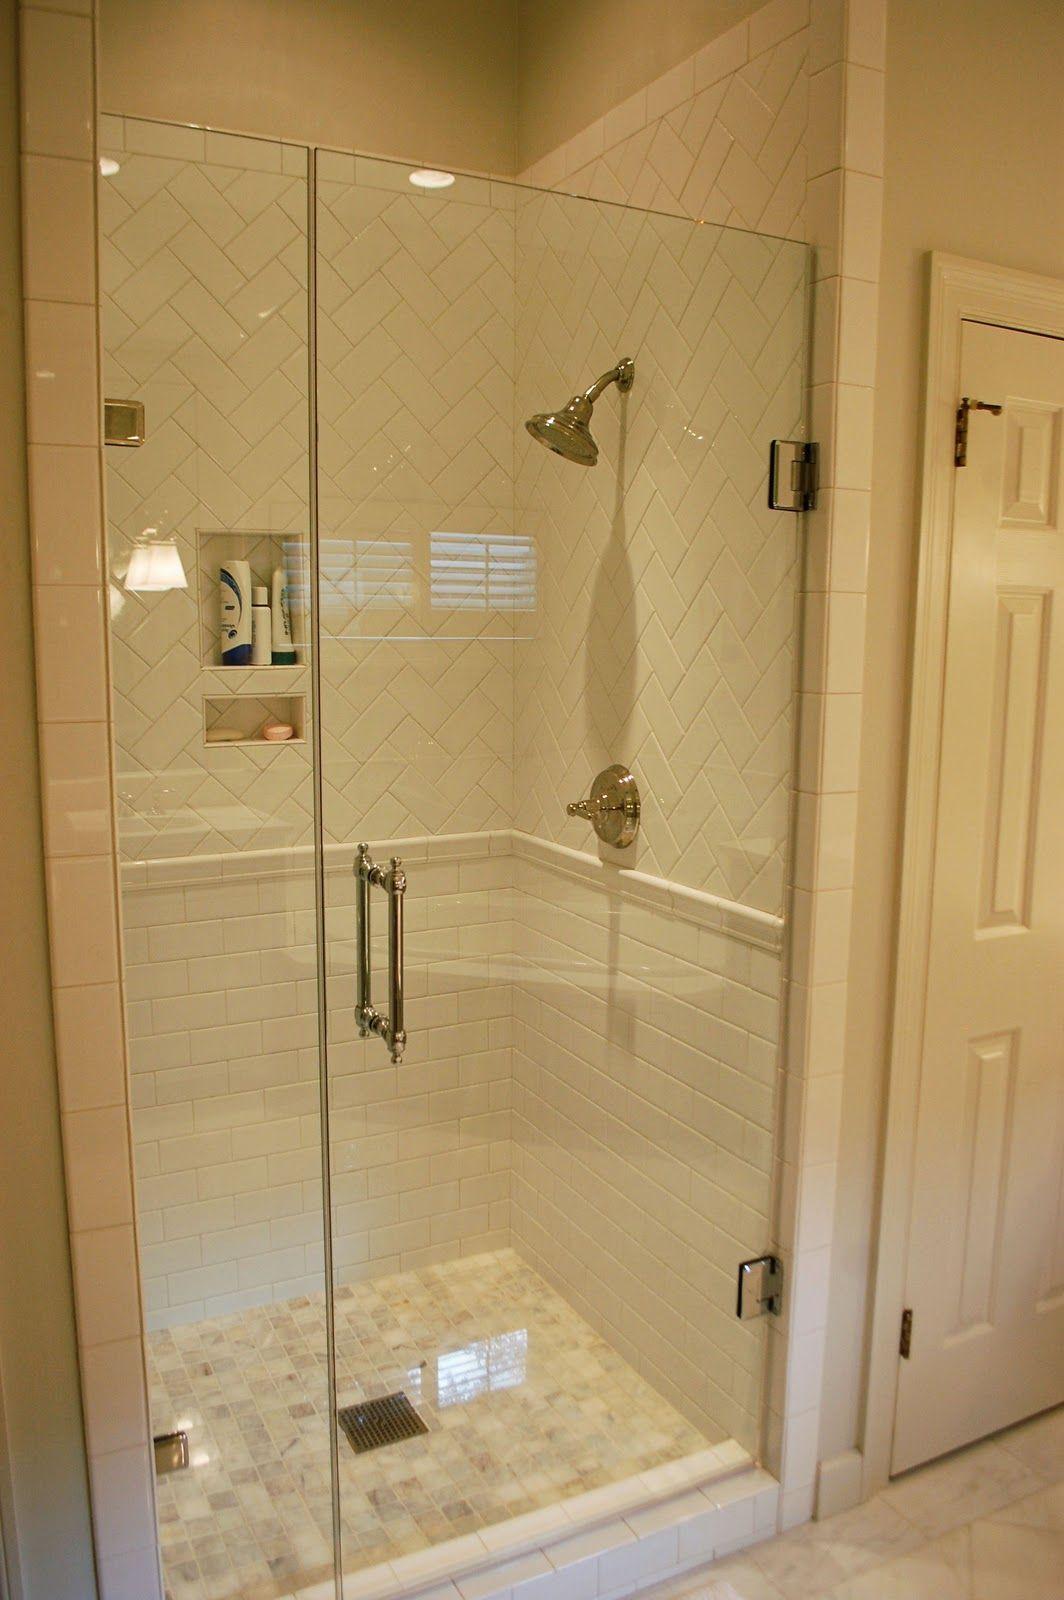 Pin by megan on bathroom ideas bathroom shower remodel - Bathroom shower enclosures ideas ...